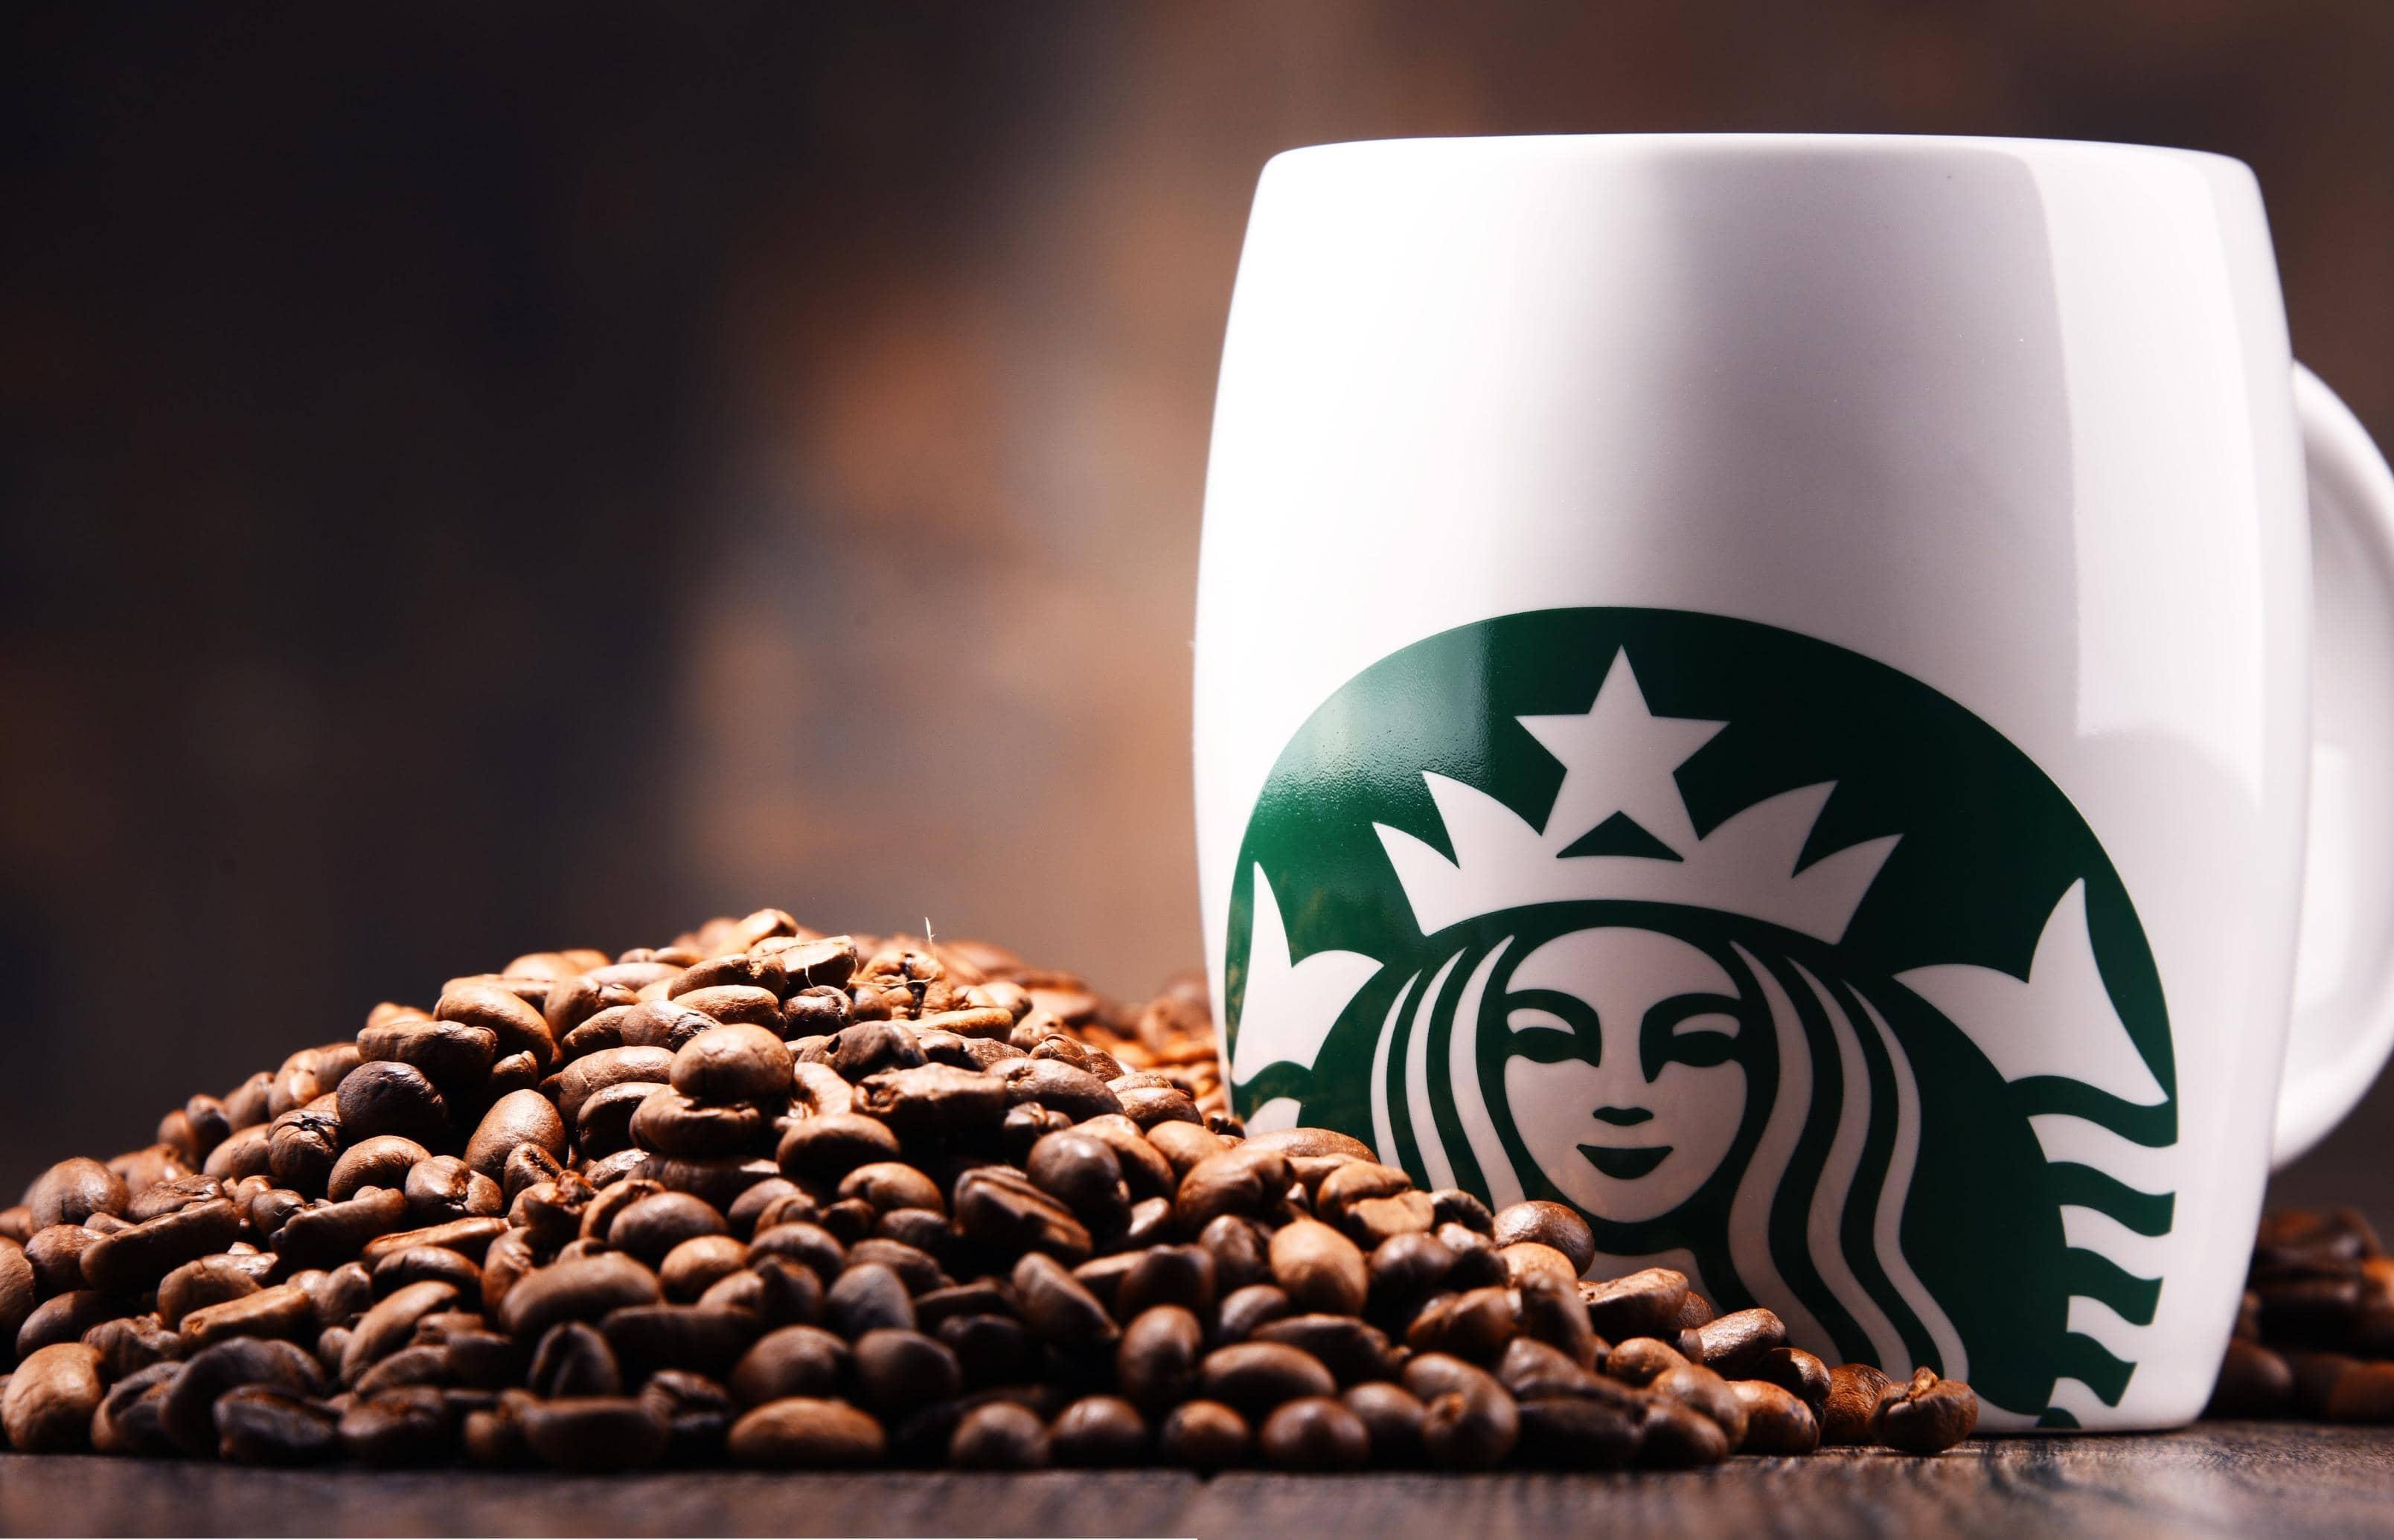 The Grand Coffee Maker